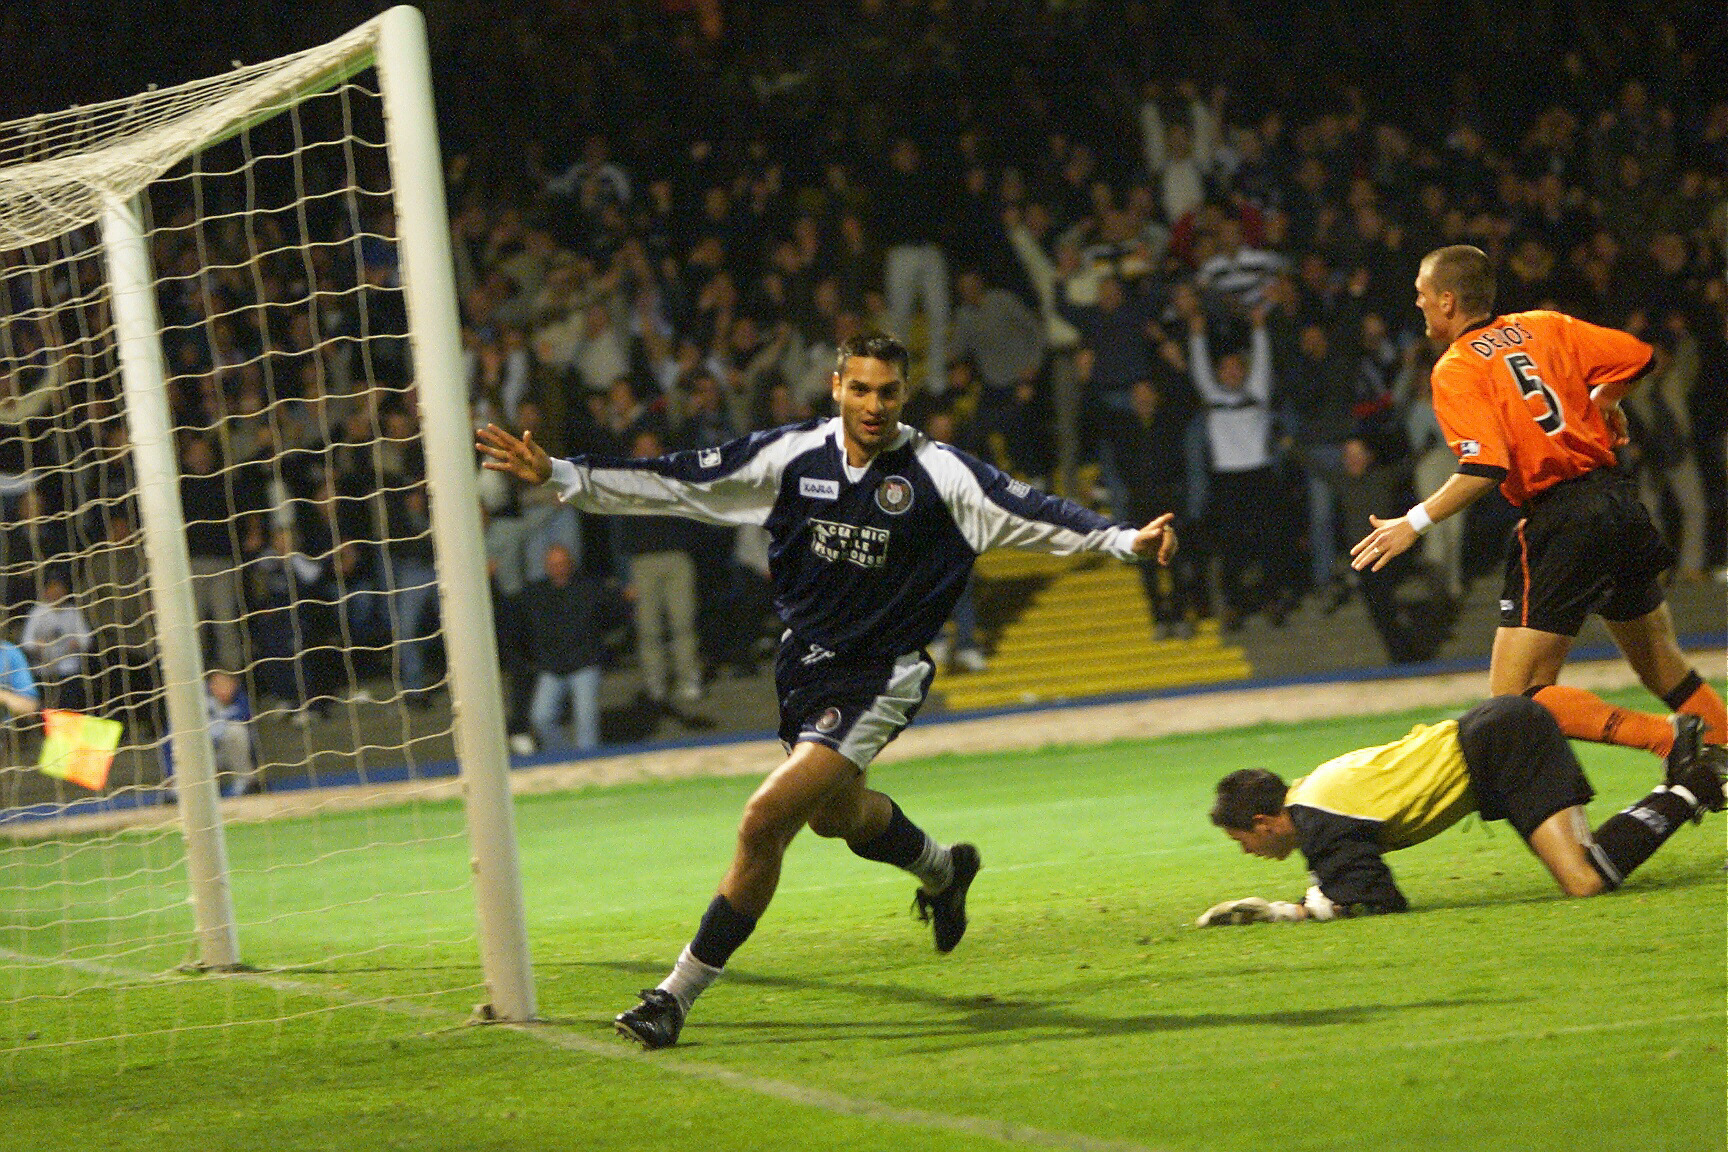 Juan Sara celebrates strike against Dundee United